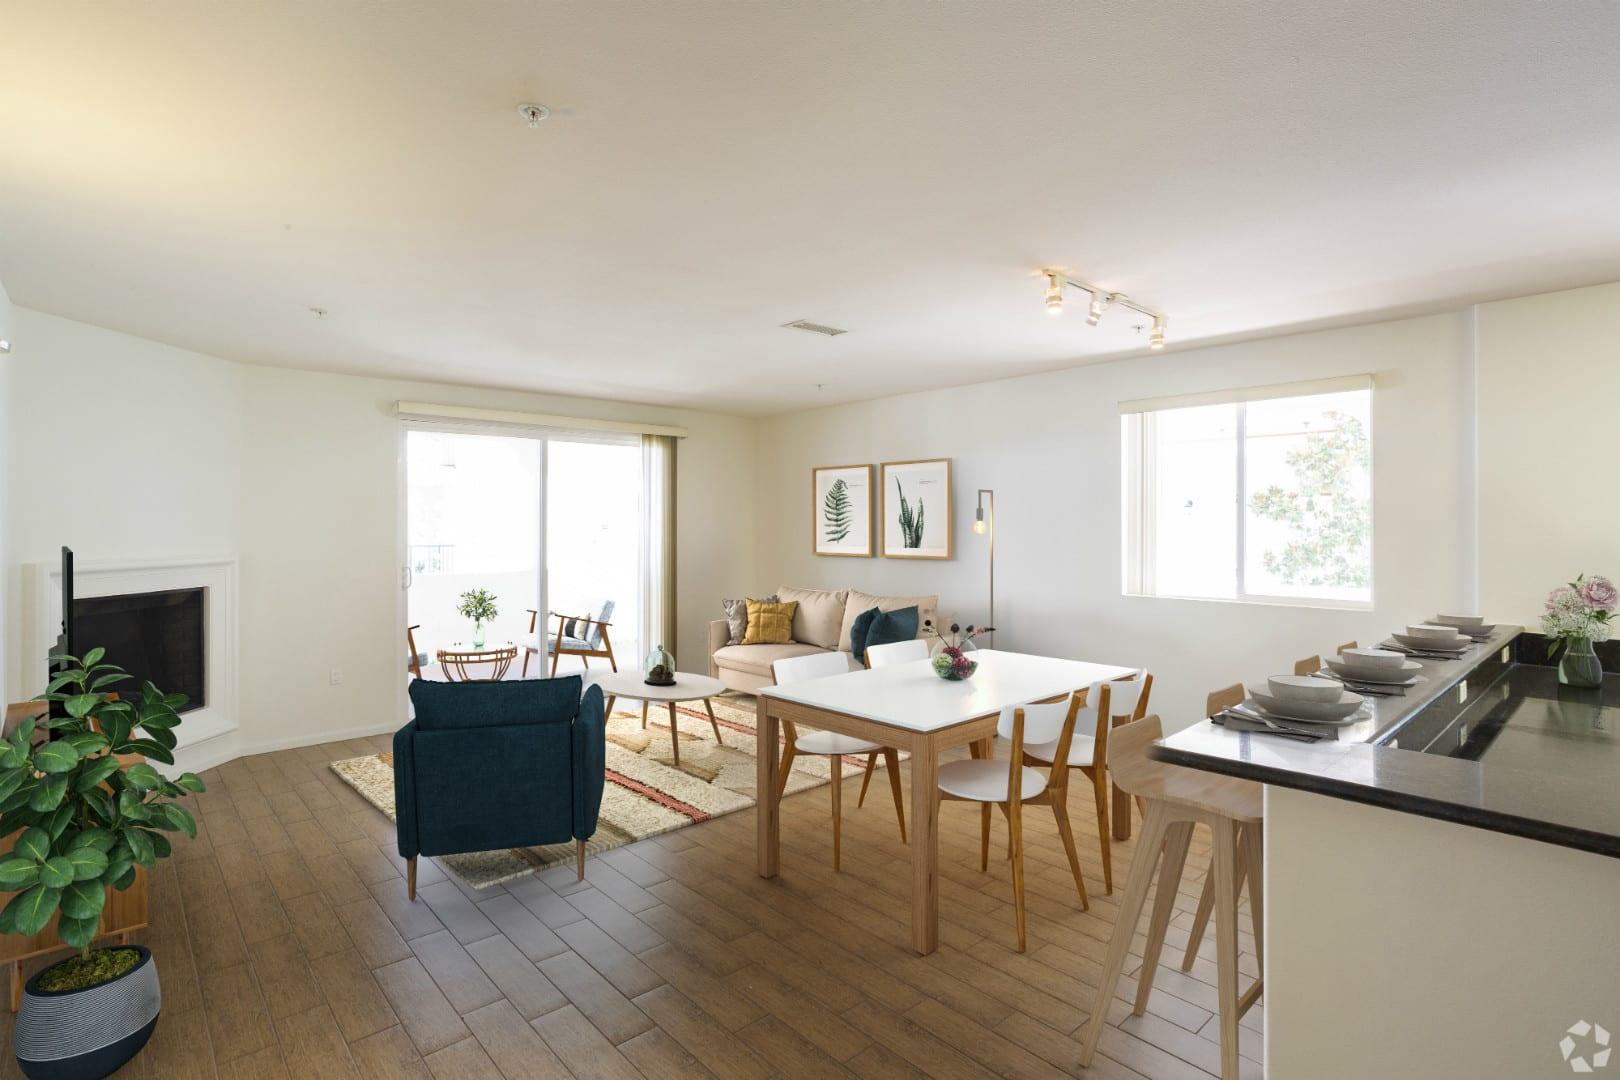 Deels_Le_Blanc_Apartment_Homes_West_Hills_Living